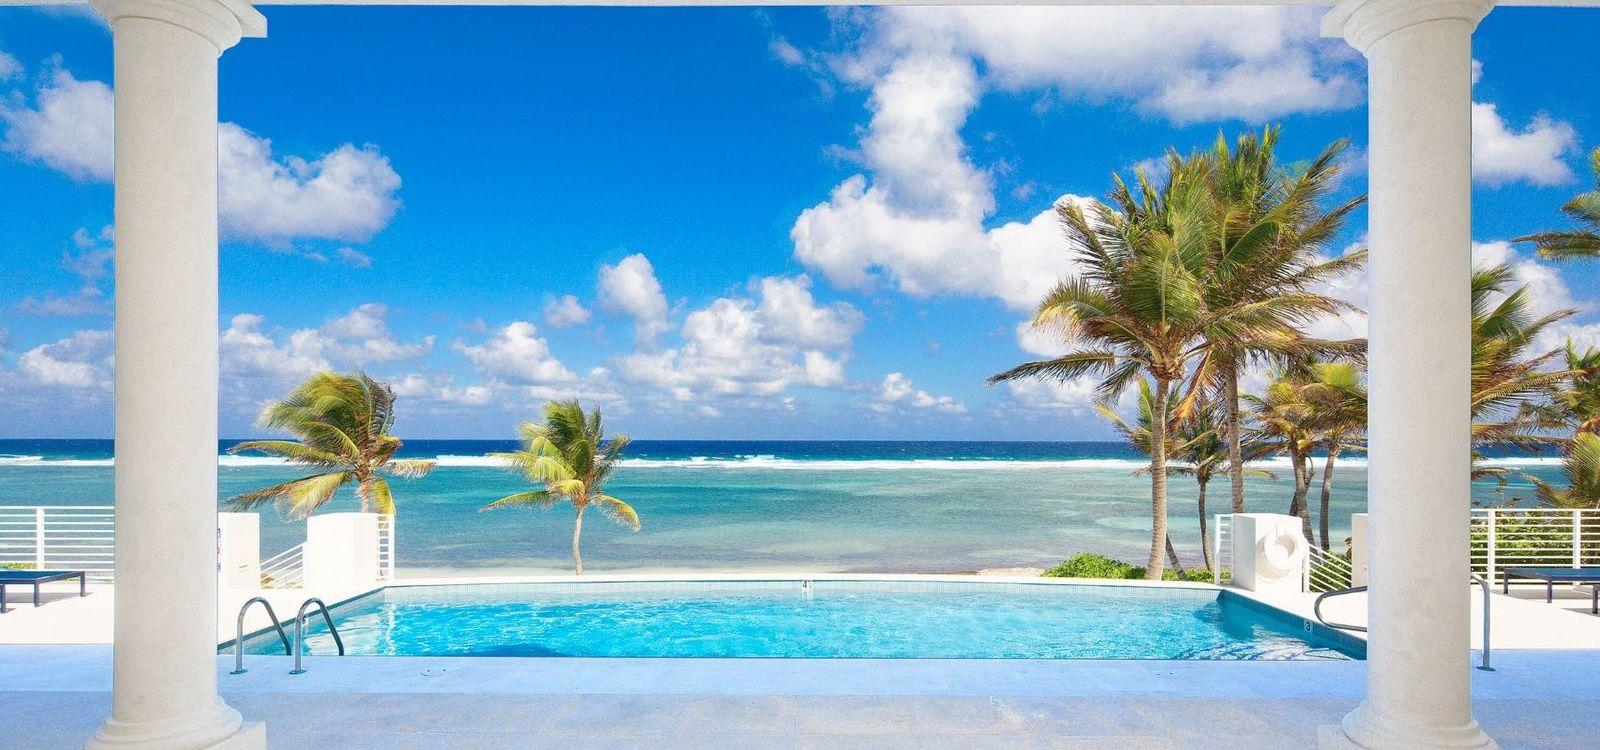 6 bedroom beachfront home for sale cayman kai grand